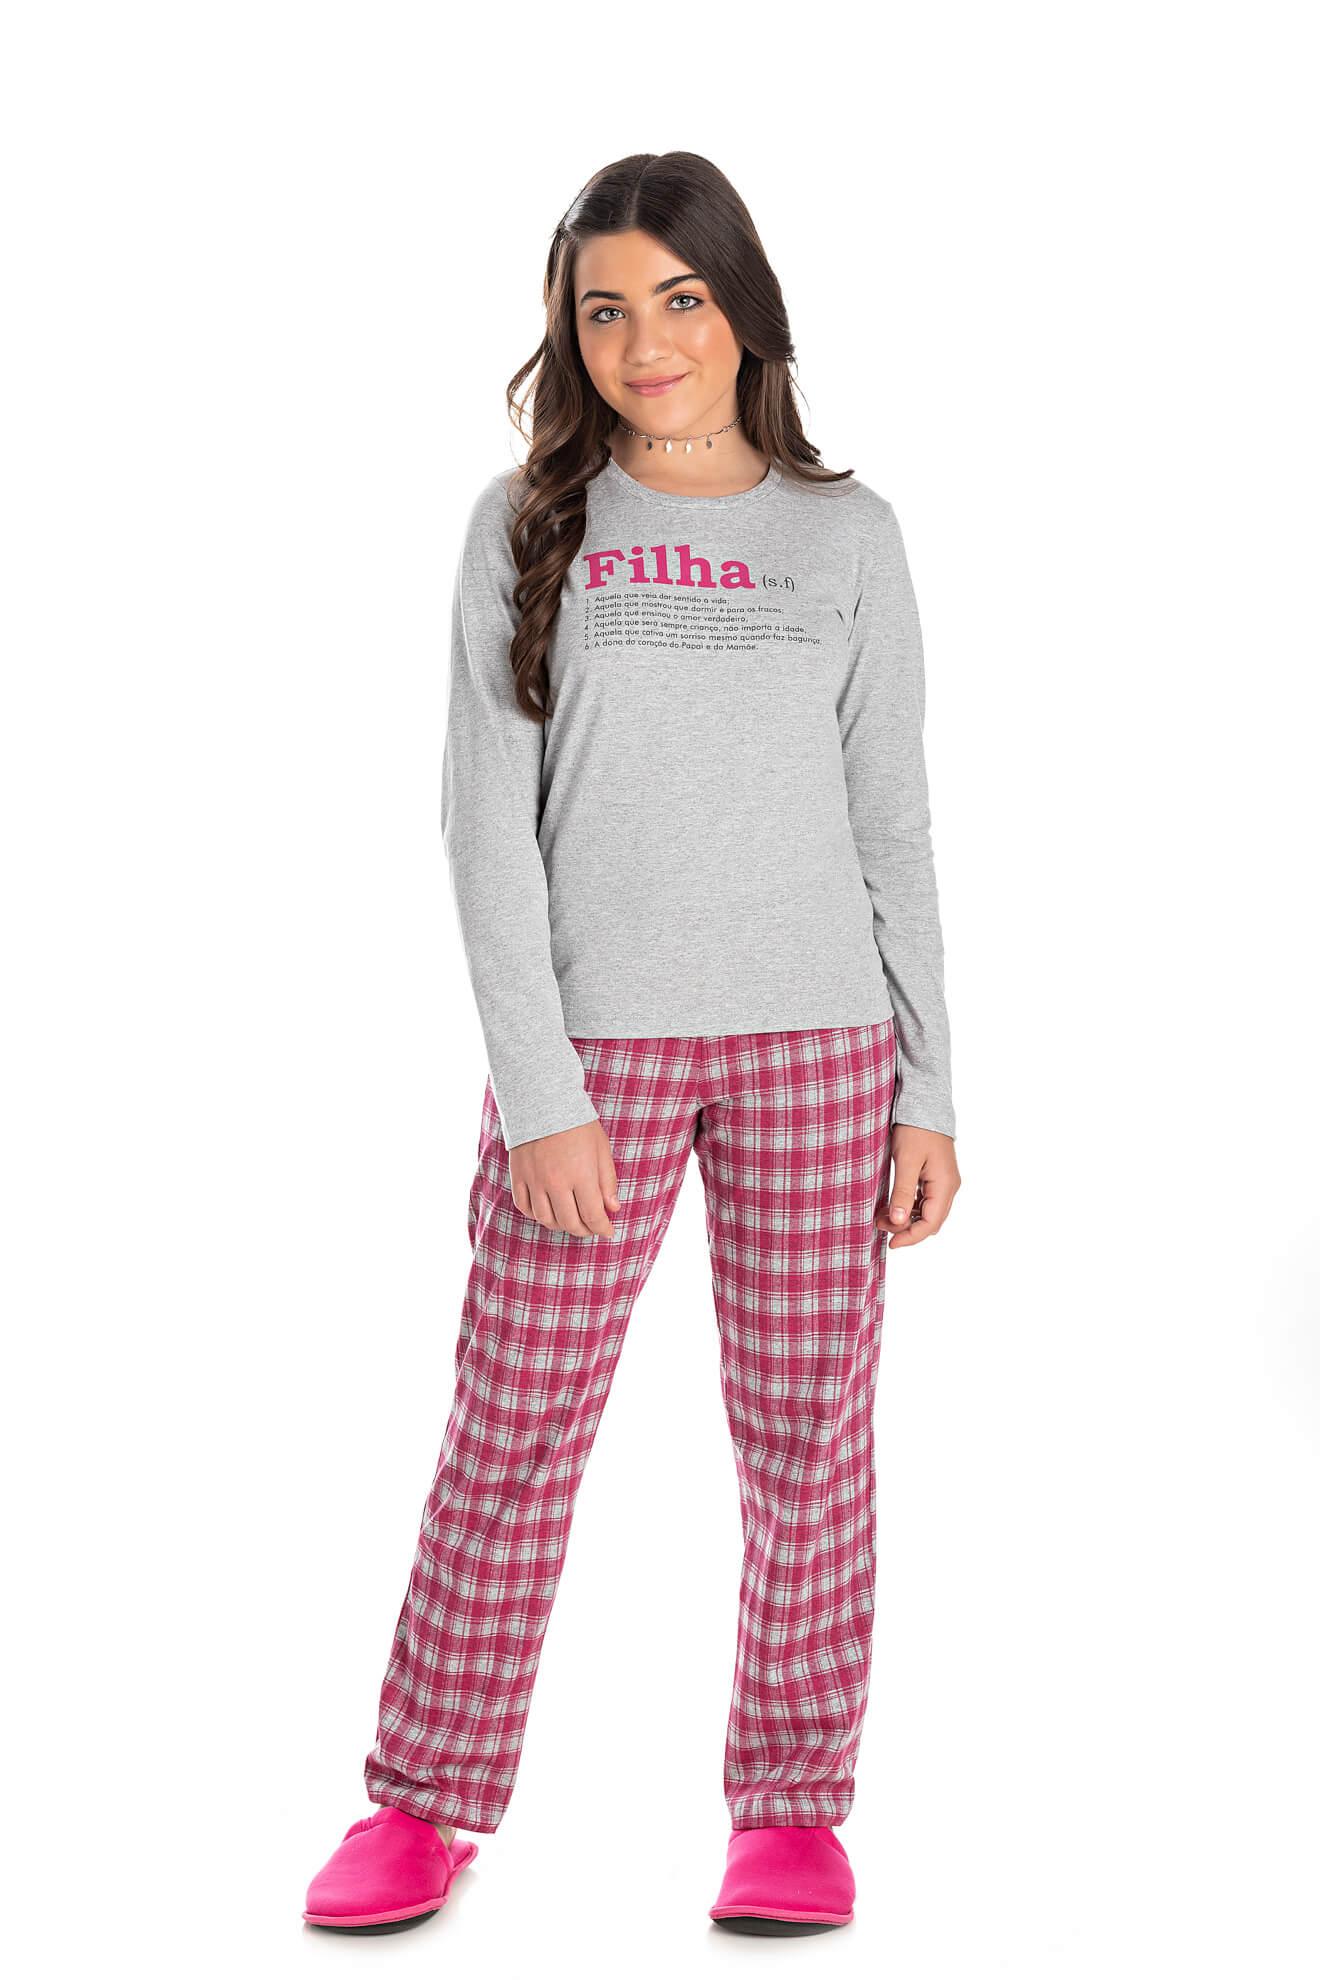 004/E - Pijama Juvenil Feminino Xadrez Família Completa